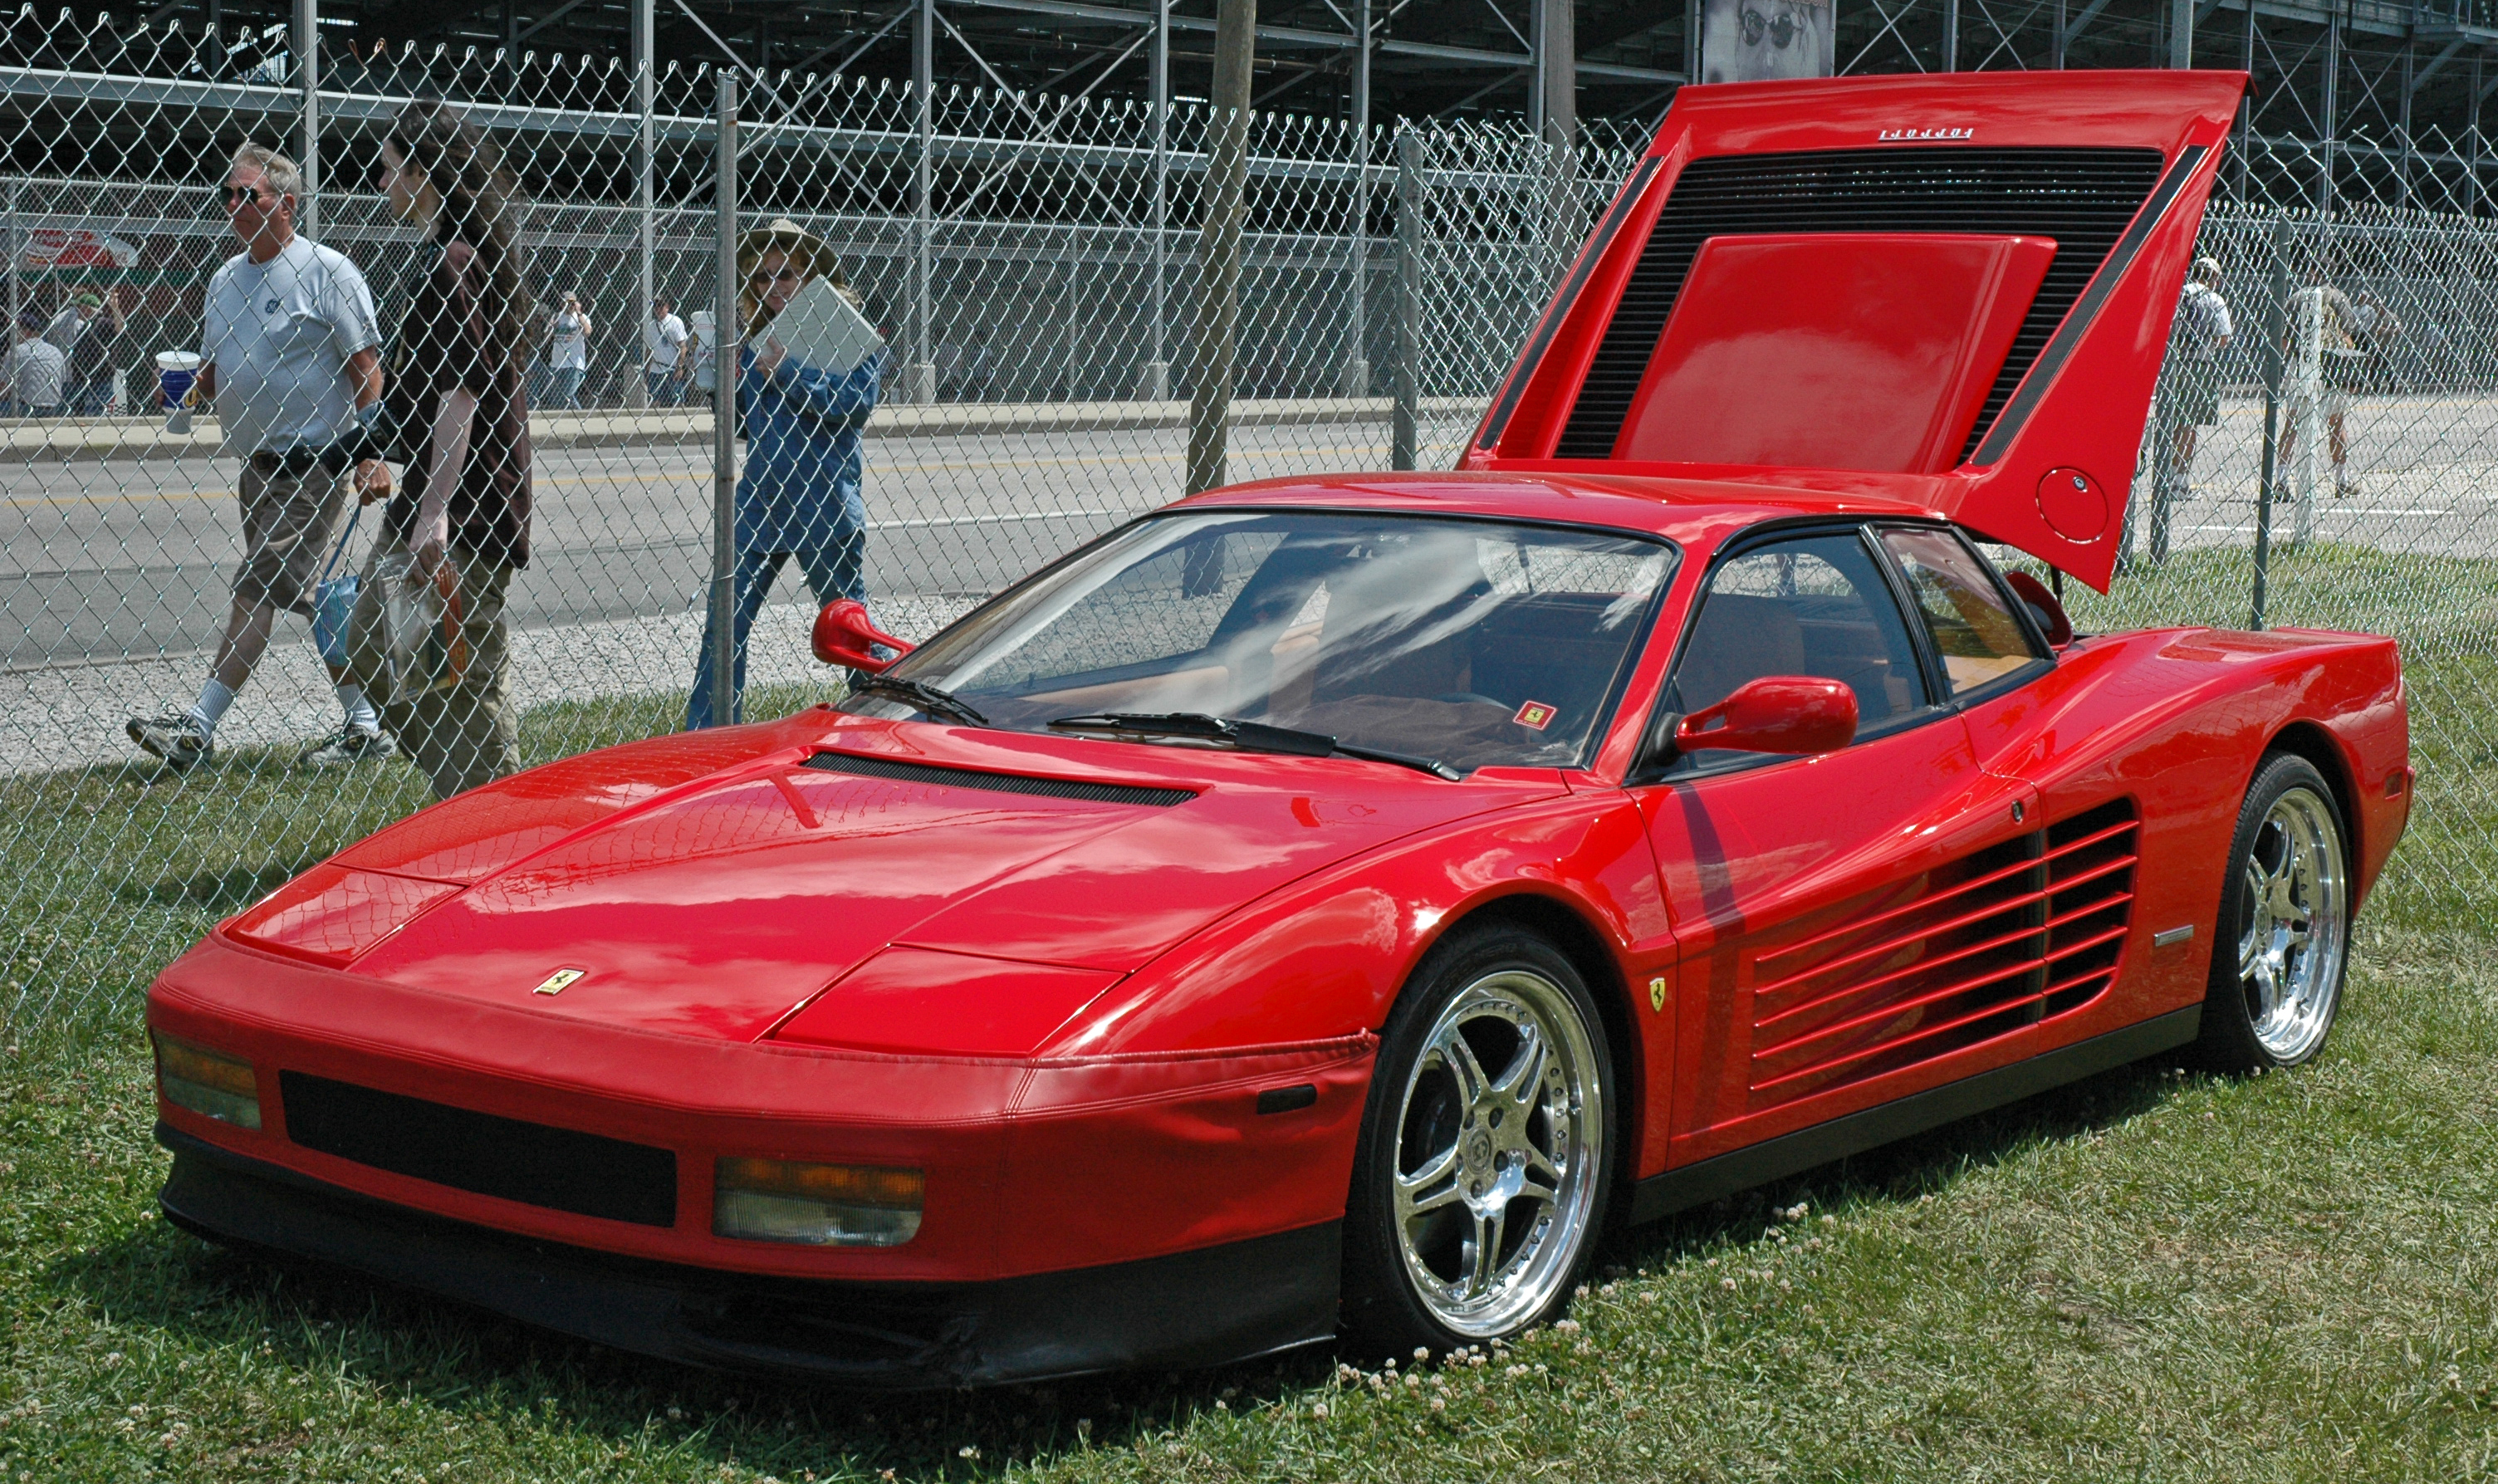 File Ferrari Testarossajpg b9CMMHWG